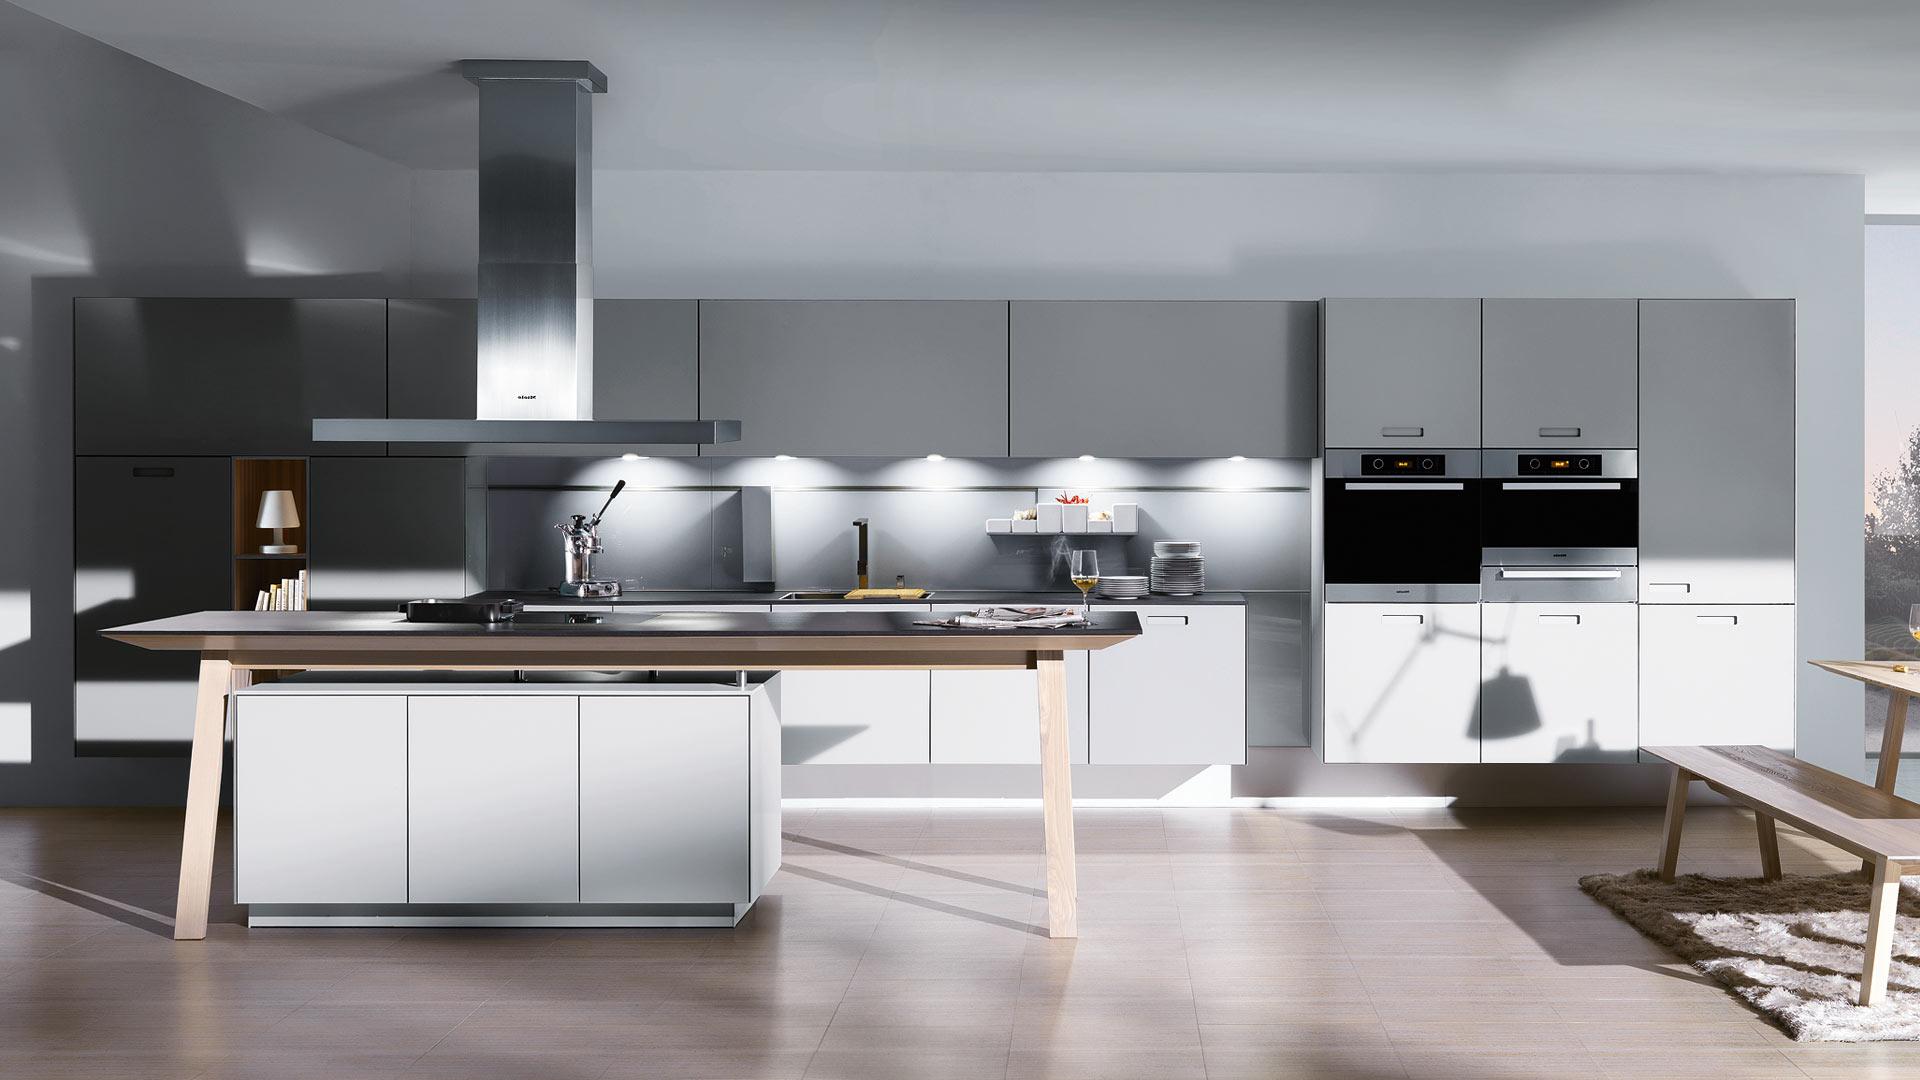 sch ller k chen next 125. Black Bedroom Furniture Sets. Home Design Ideas